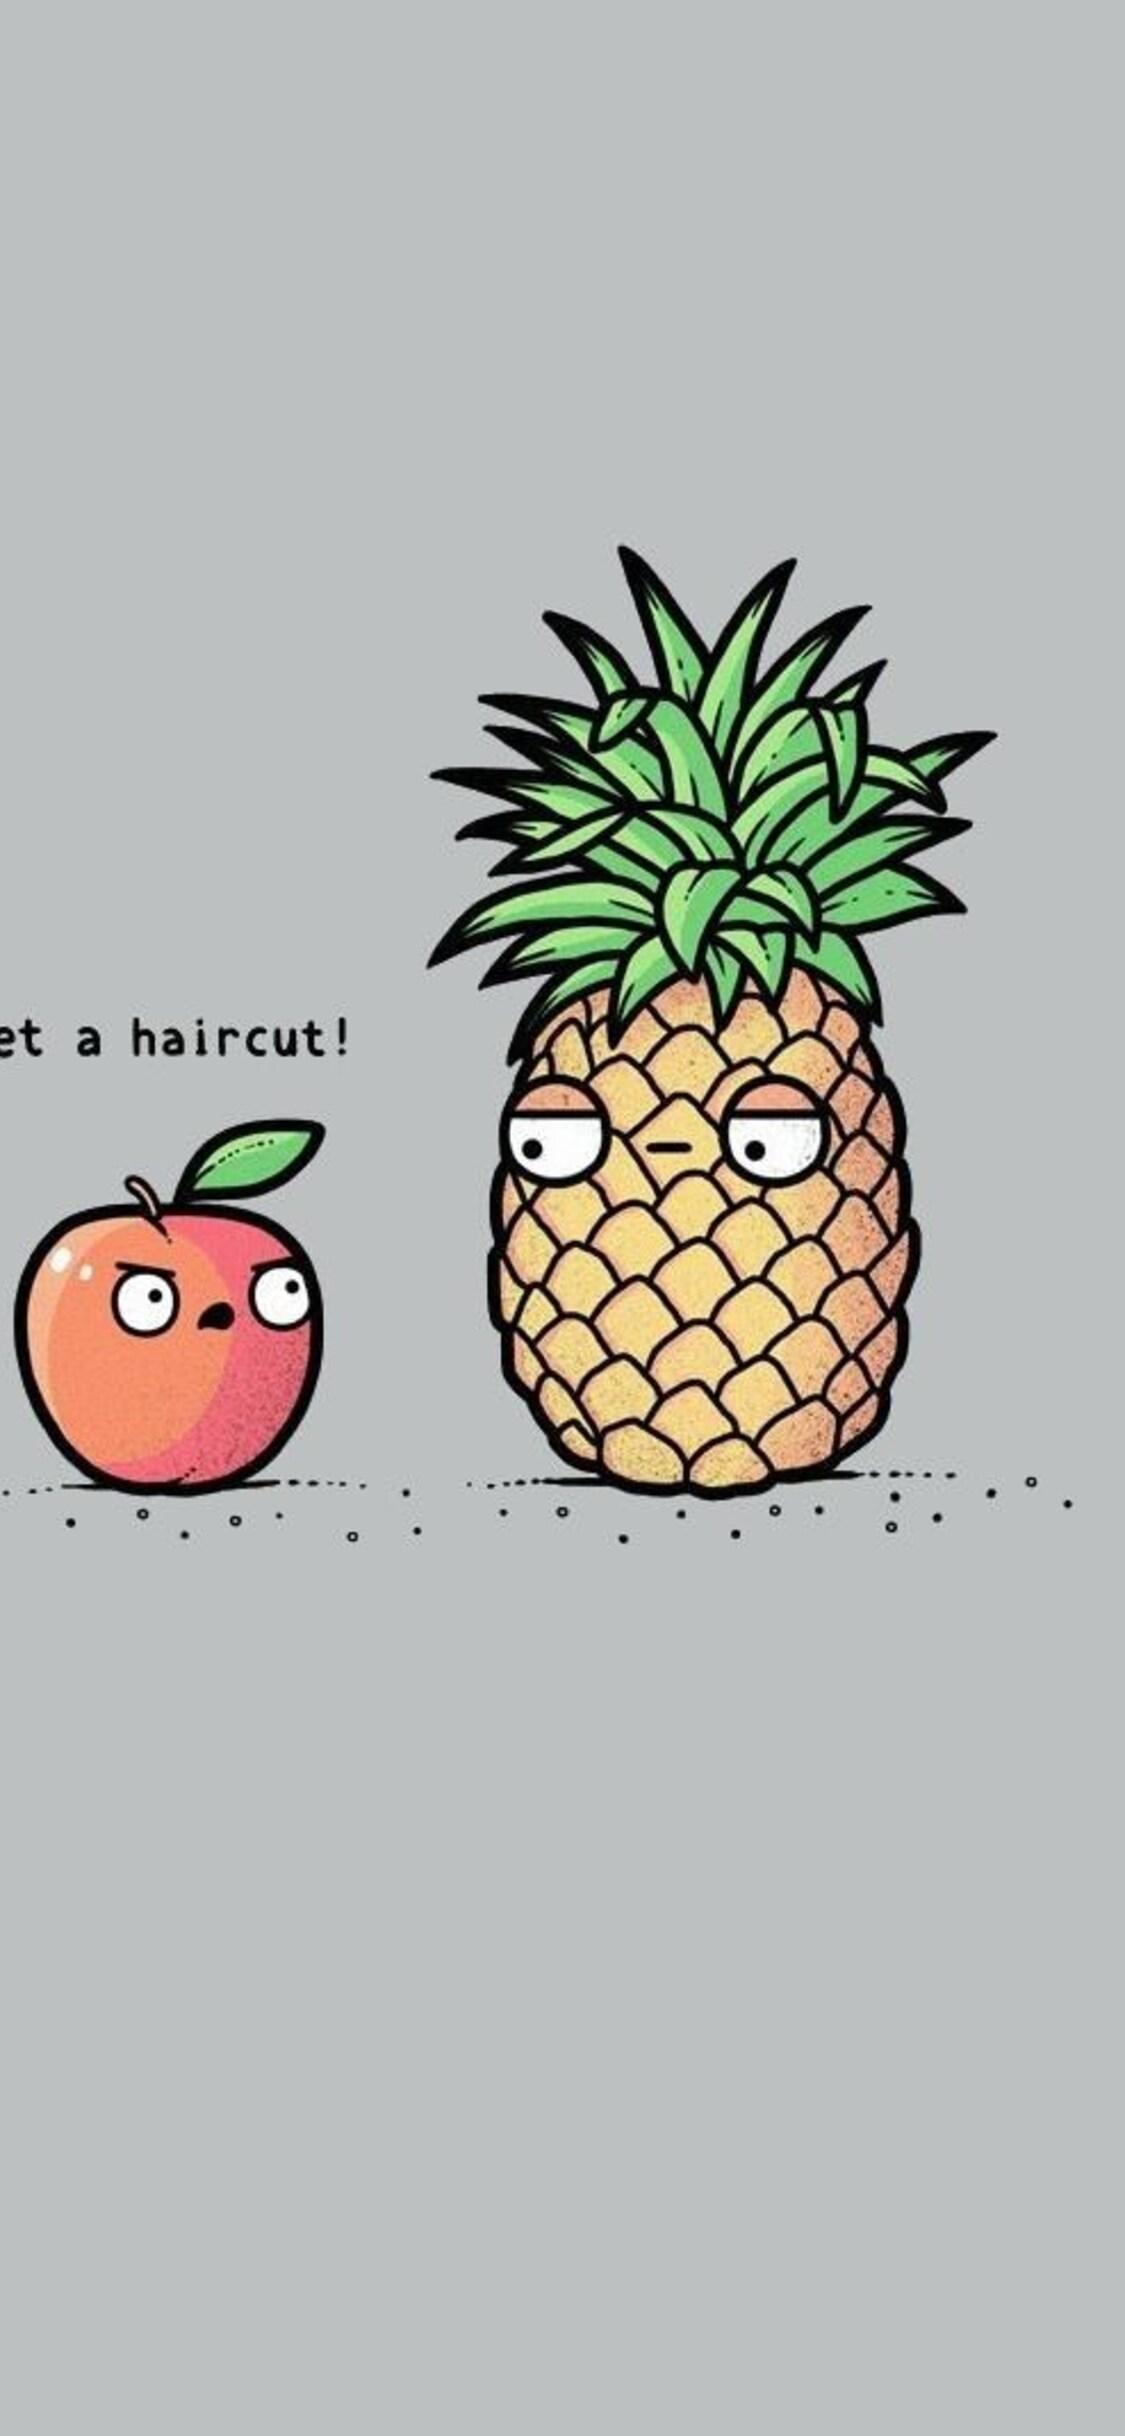 get-a-haircut-minimalism.jpg